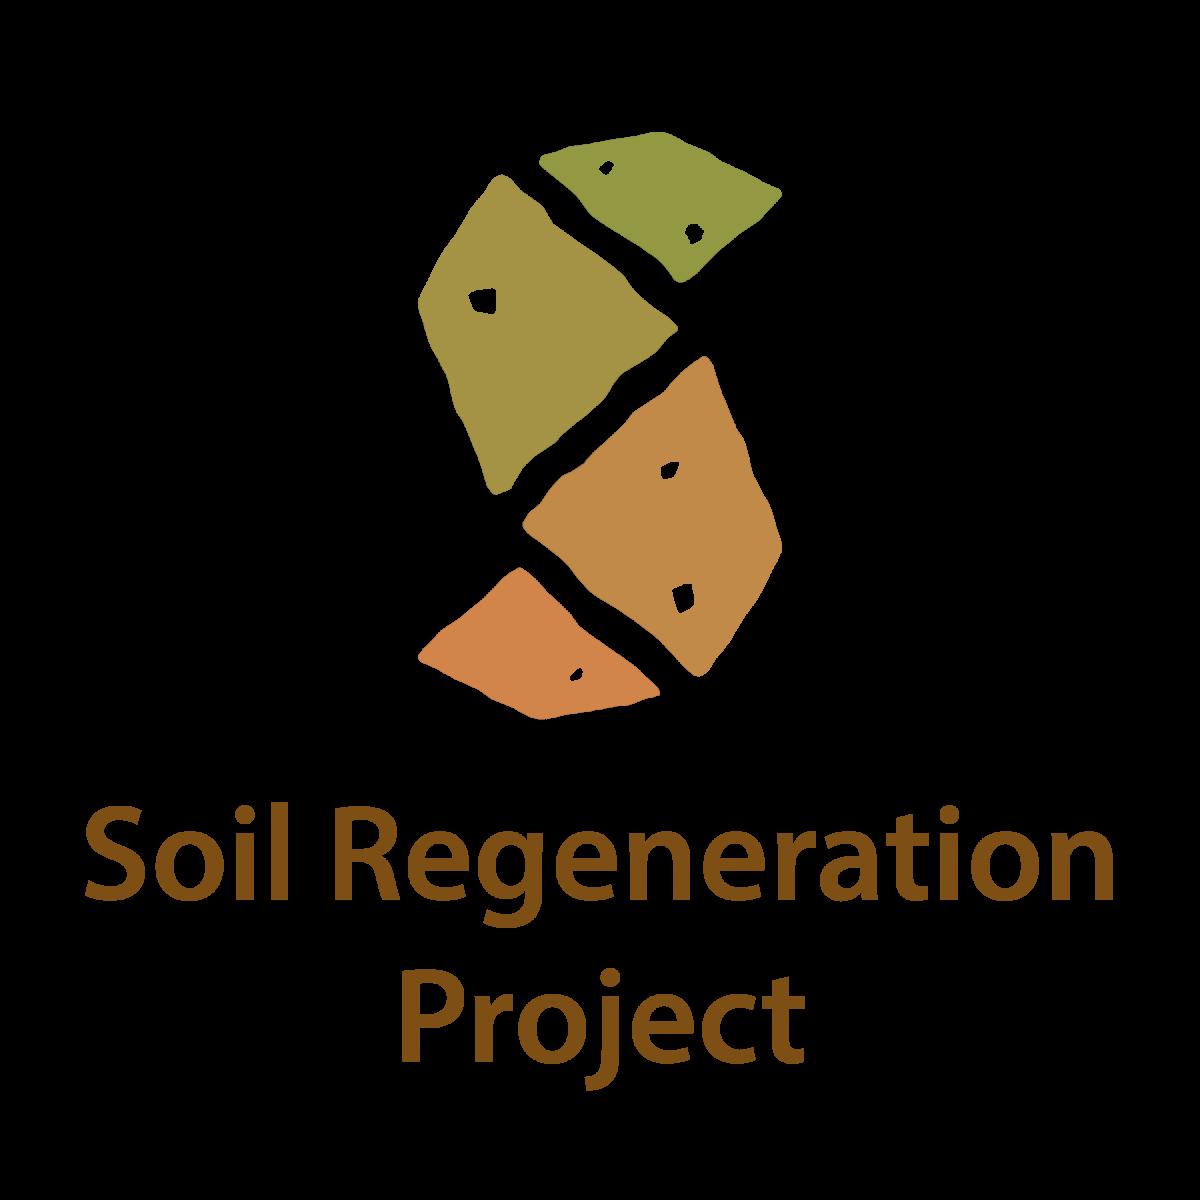 The Soil Regeneration Project